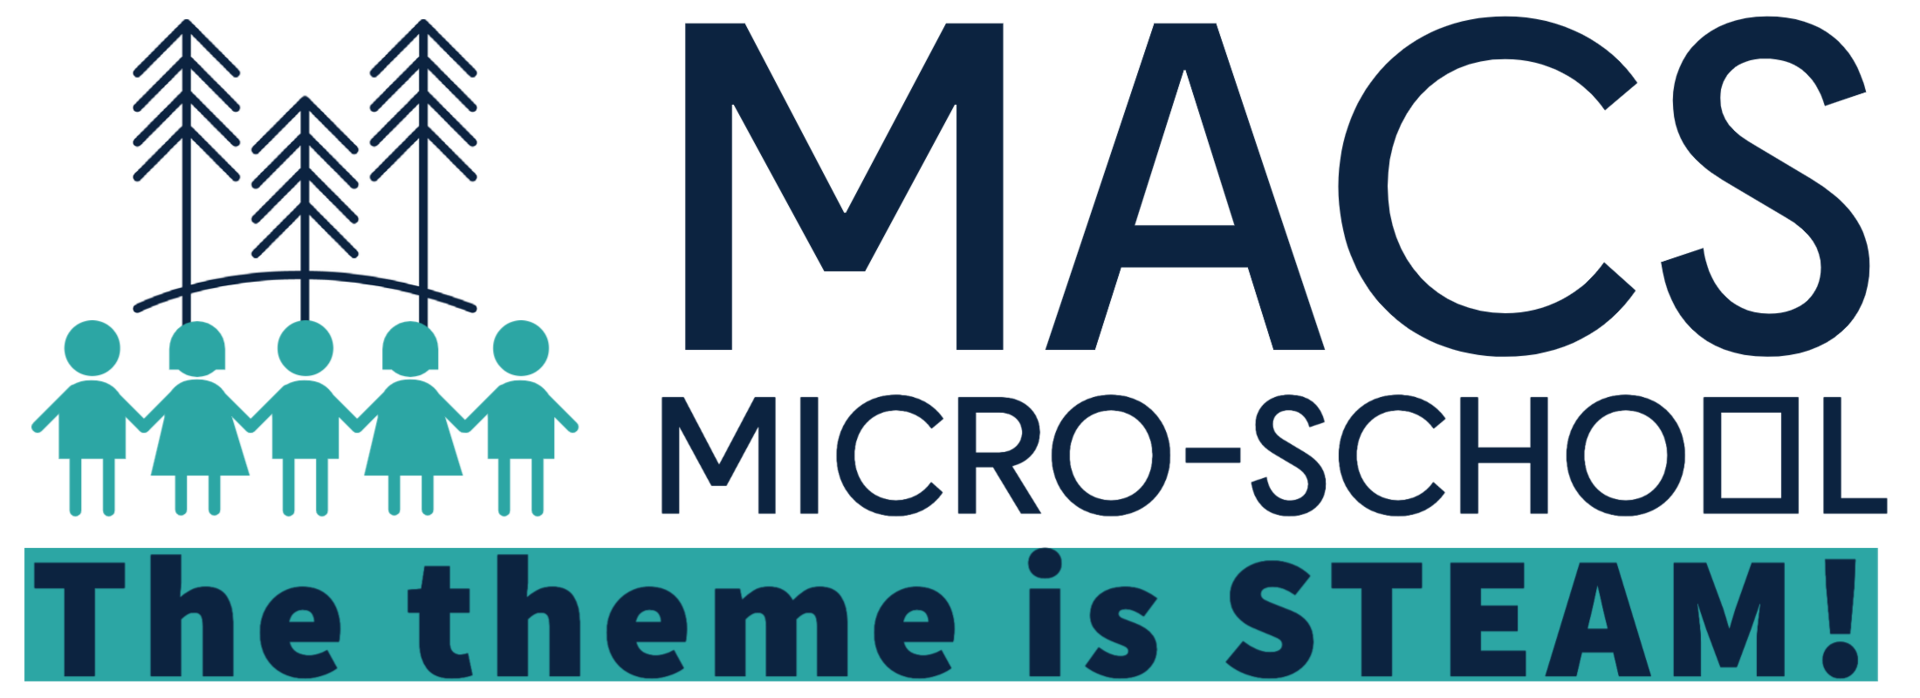 micro-school logo